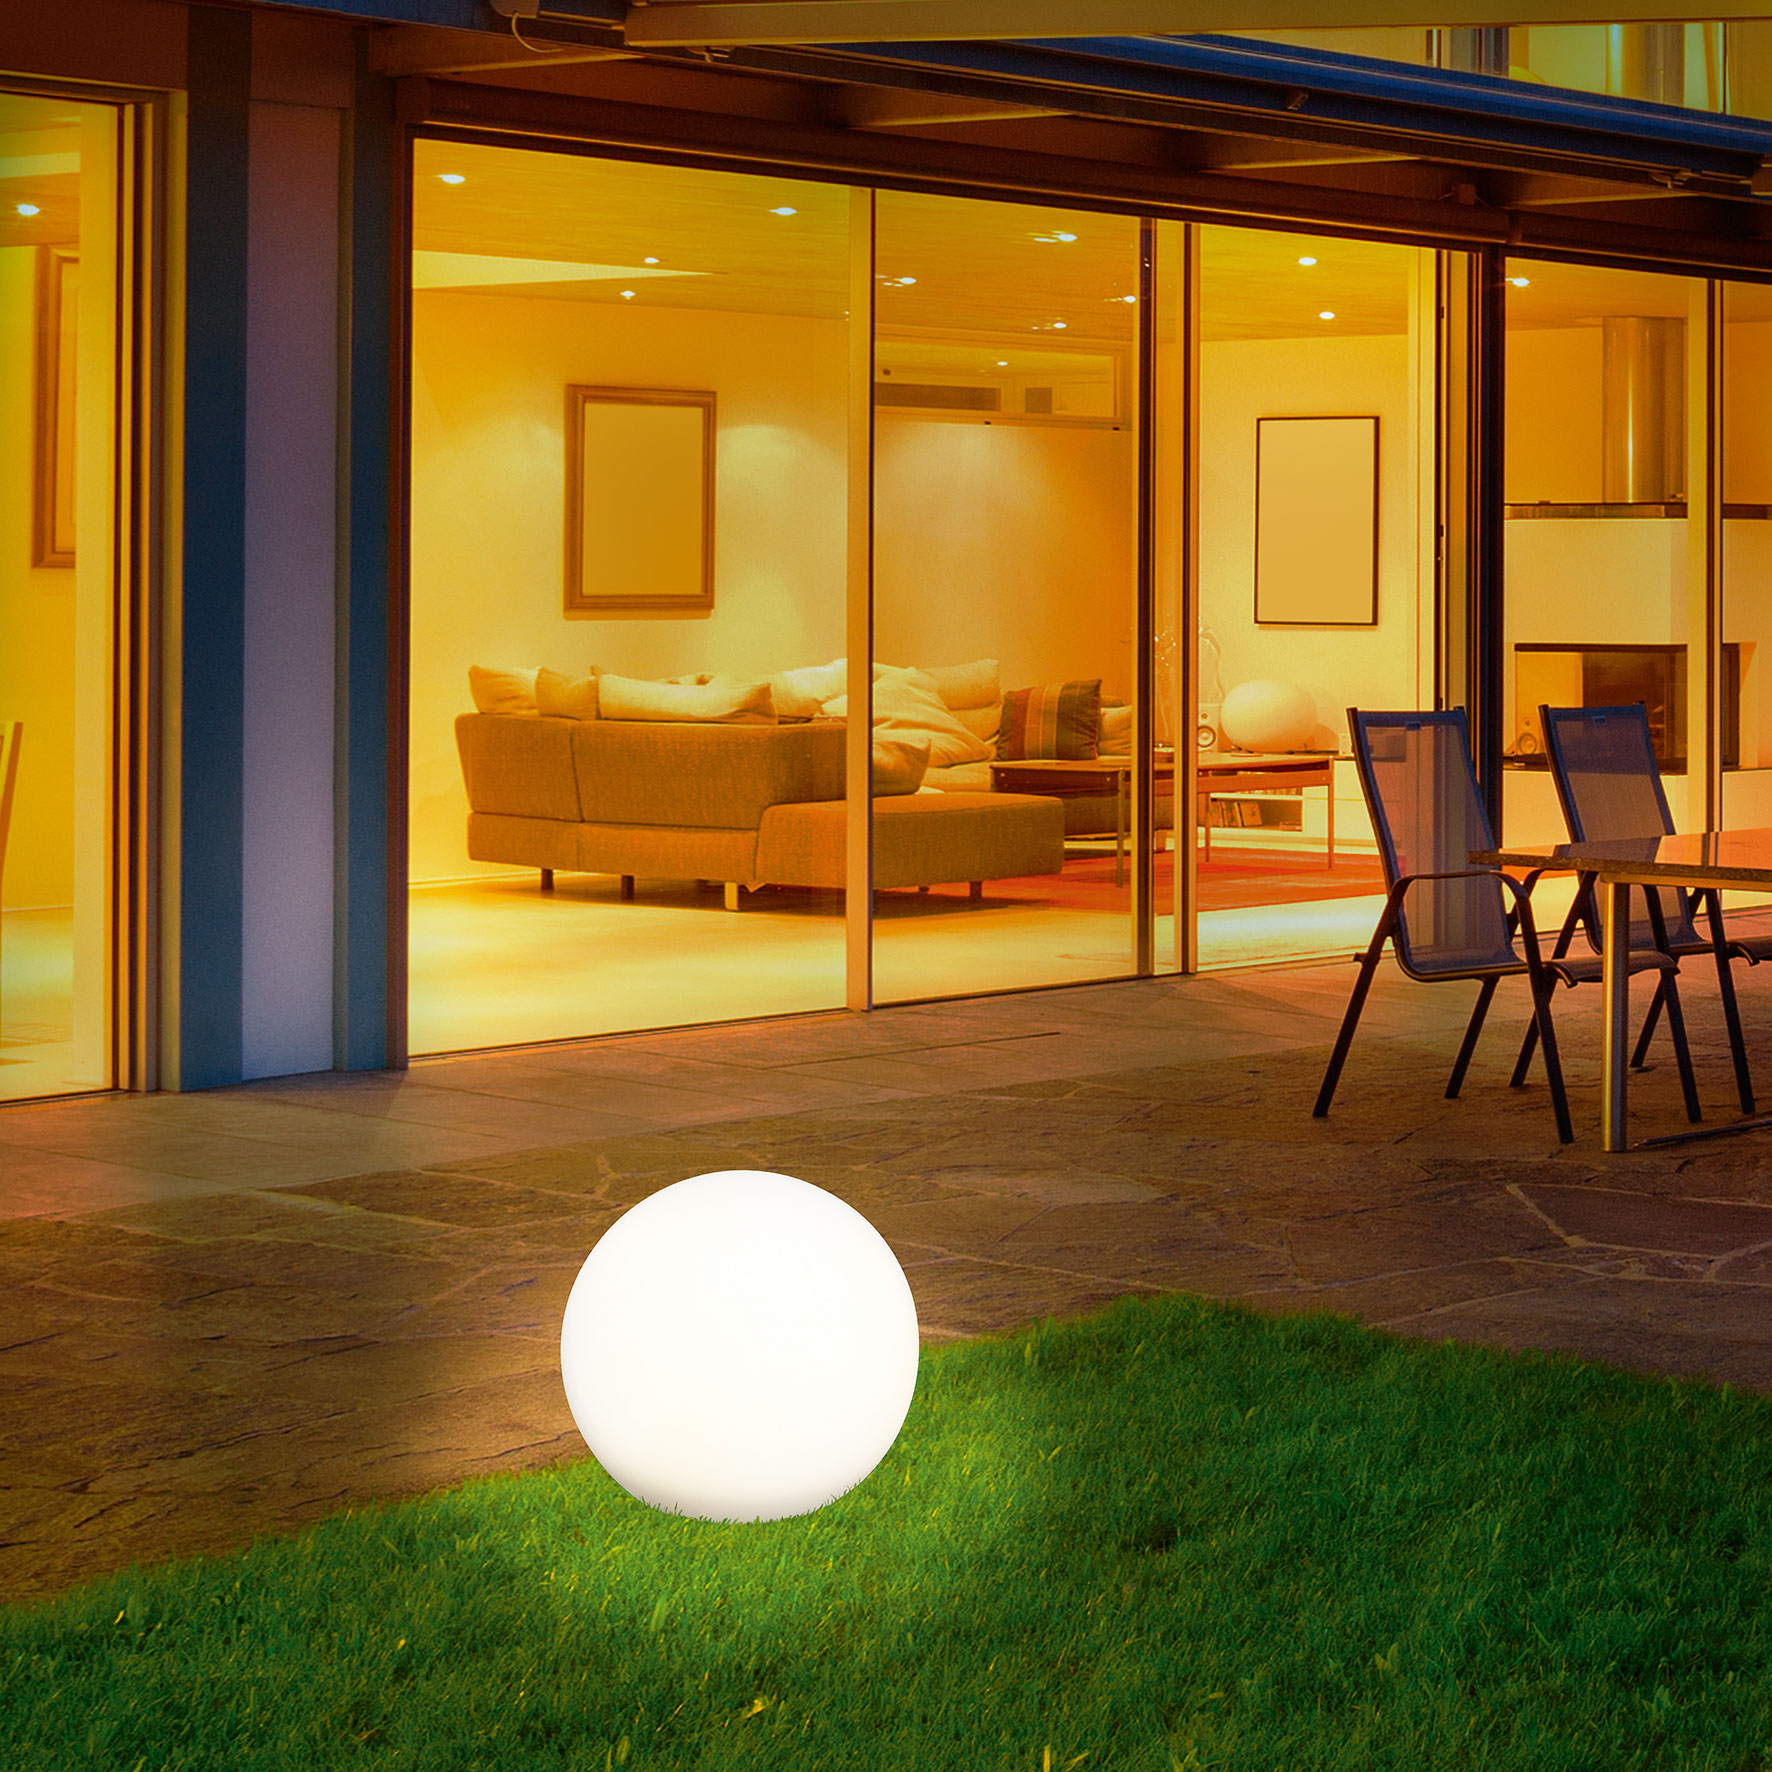 esotec 106024 Solar Leuchtkugel 30cm Solarlampe Gartenleuchte Solarkugel LED